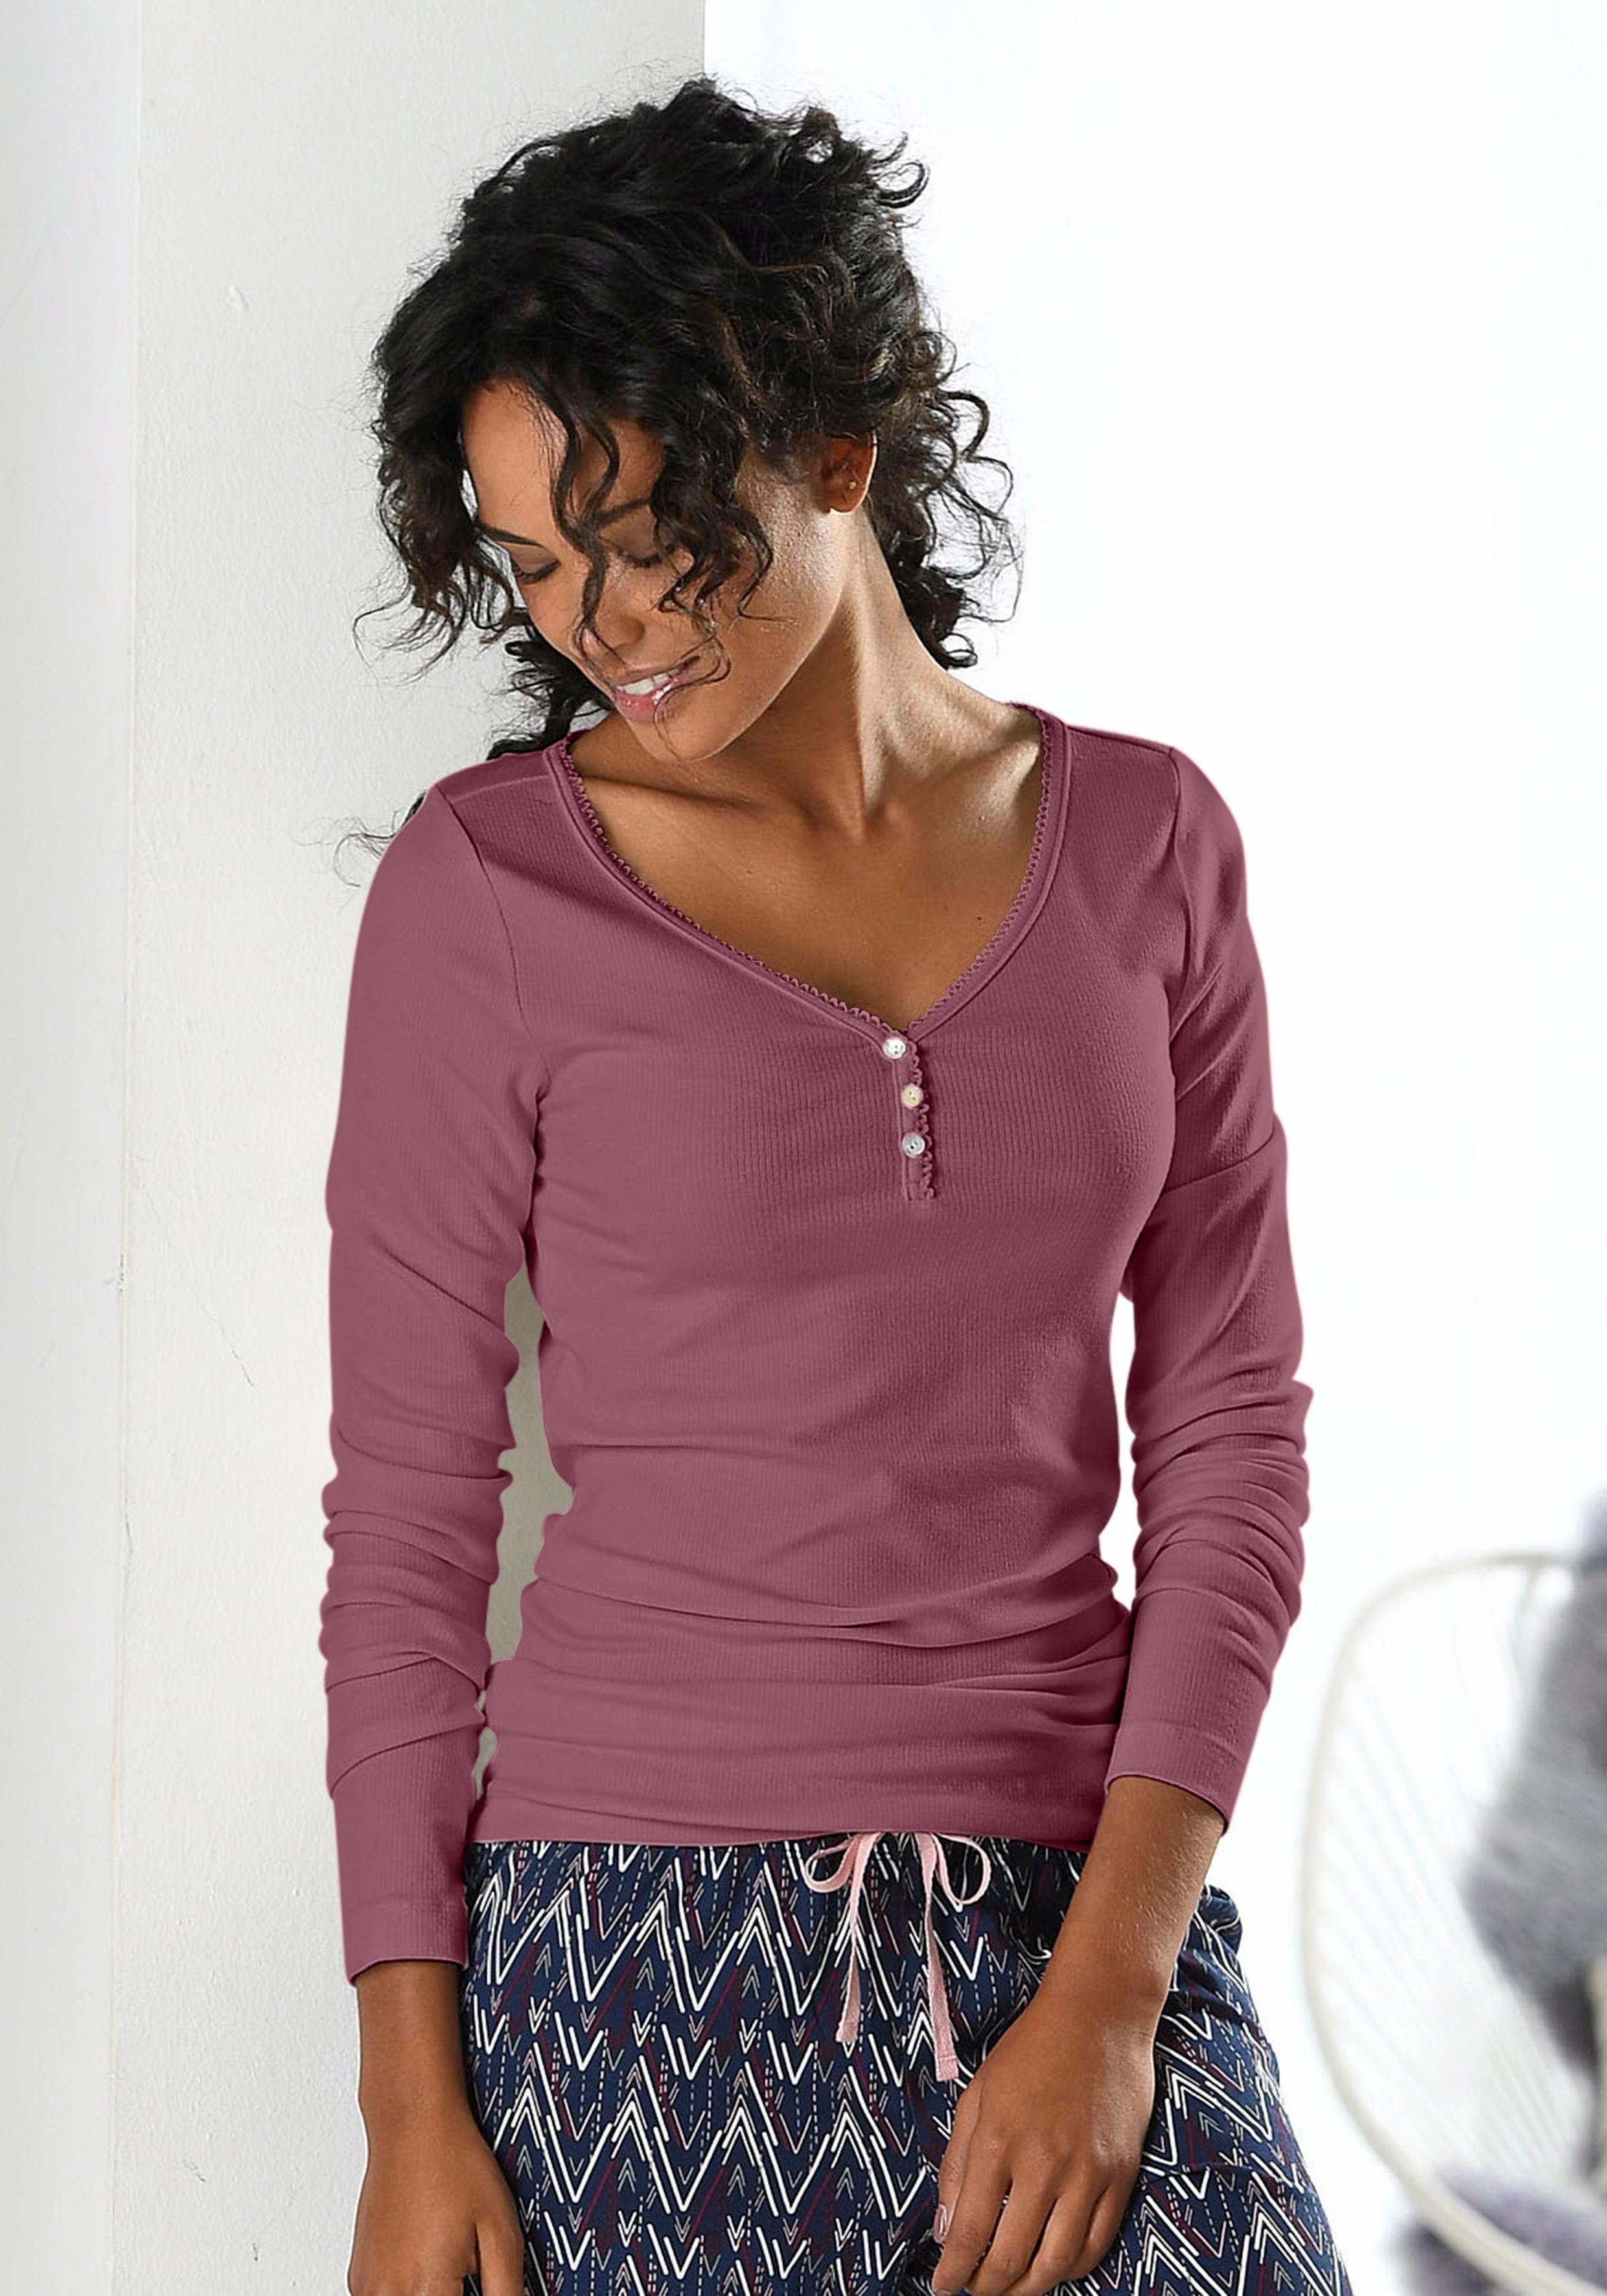 Petite Fleur shirt met lange mouwen, geribd met knoopsluiting goedkoop op lascana.nl kopen